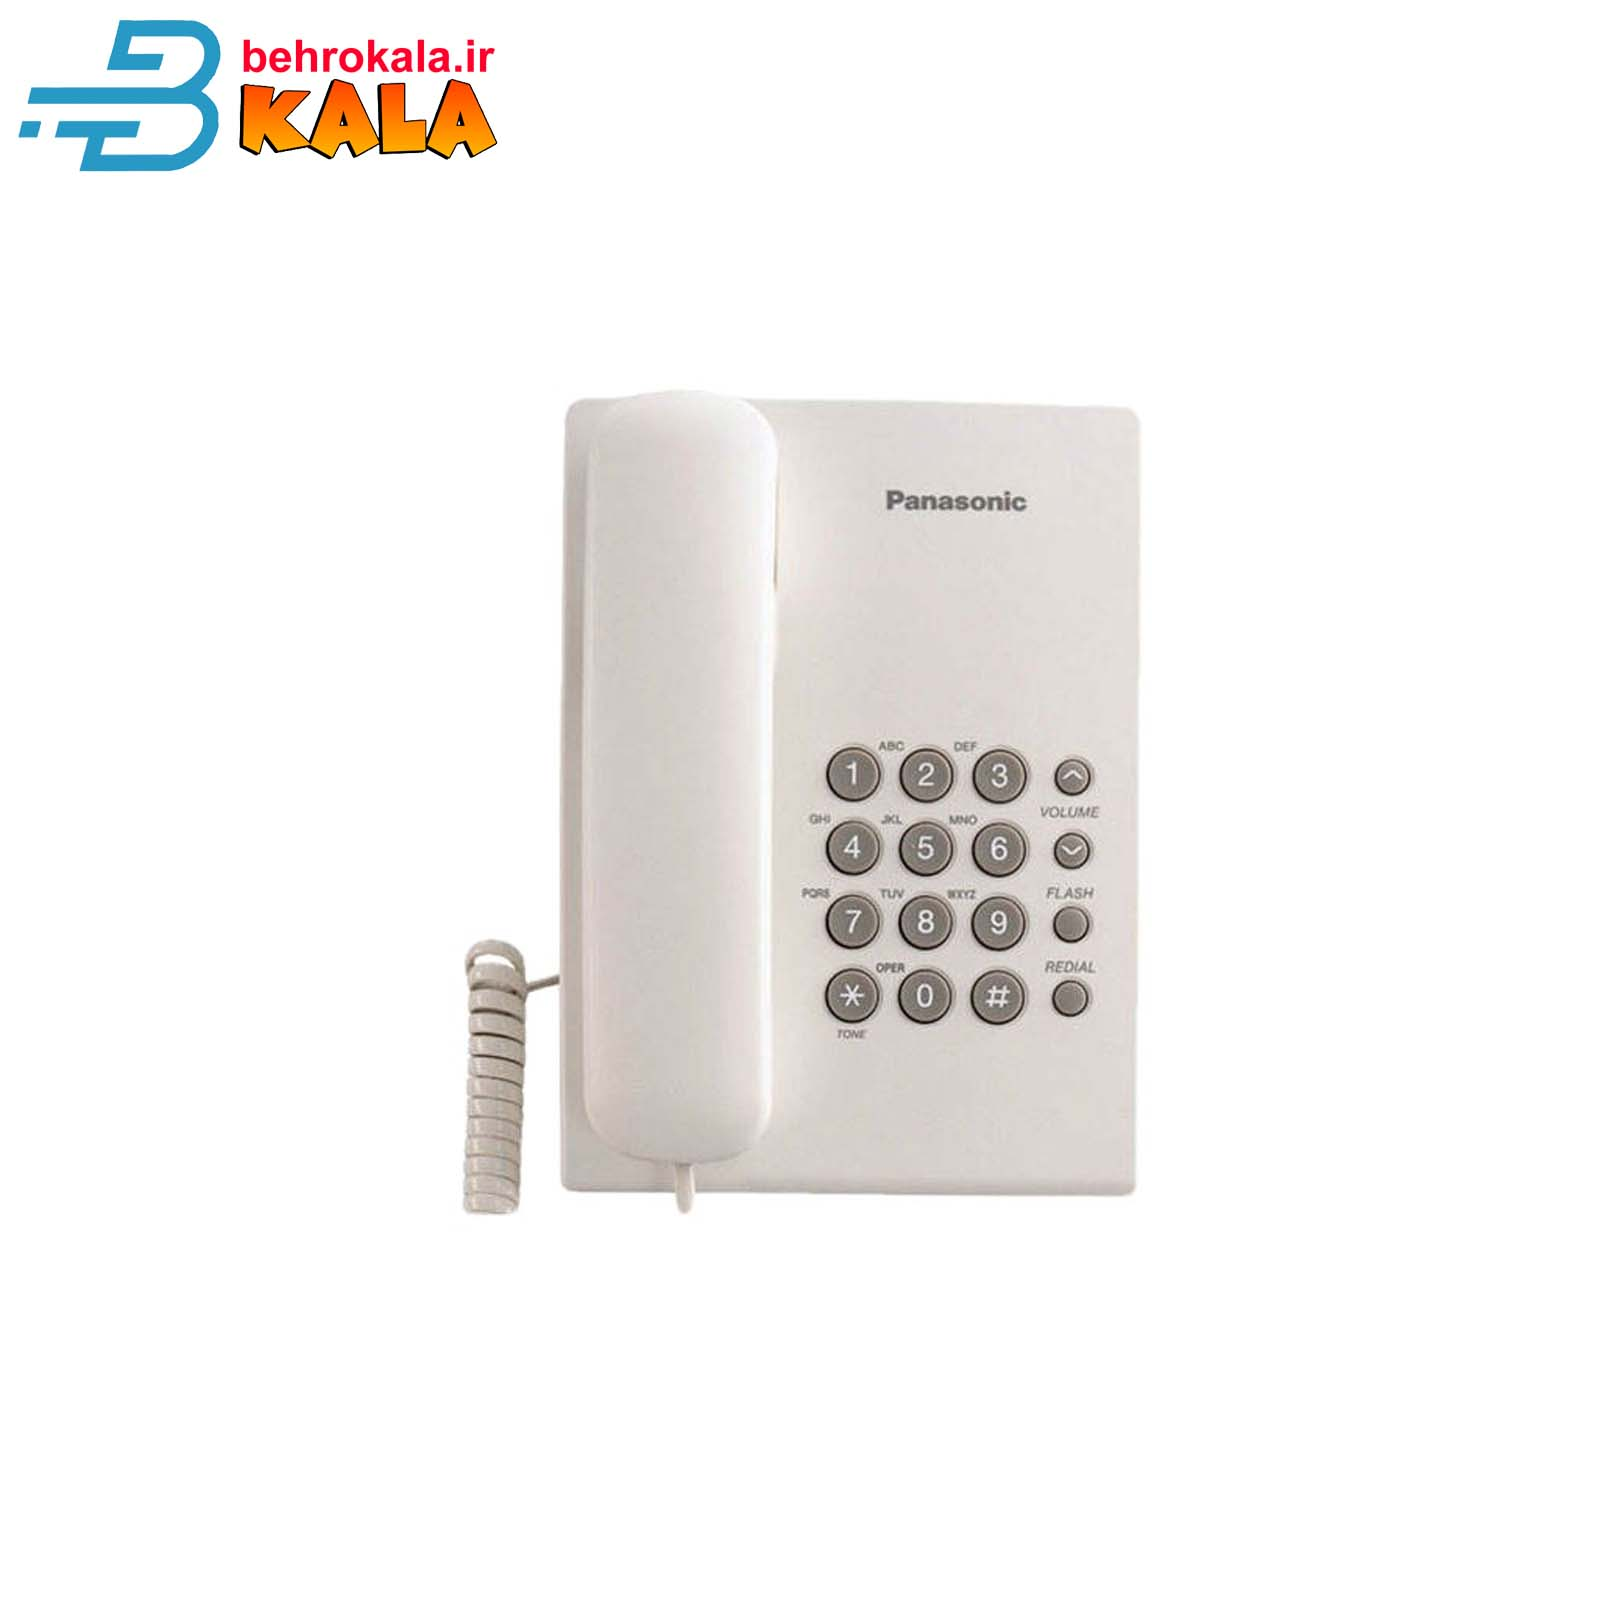 main images گوشی تلفن ثابت پاناسونیک Panasonic Corded Telephone KX-TS500MX